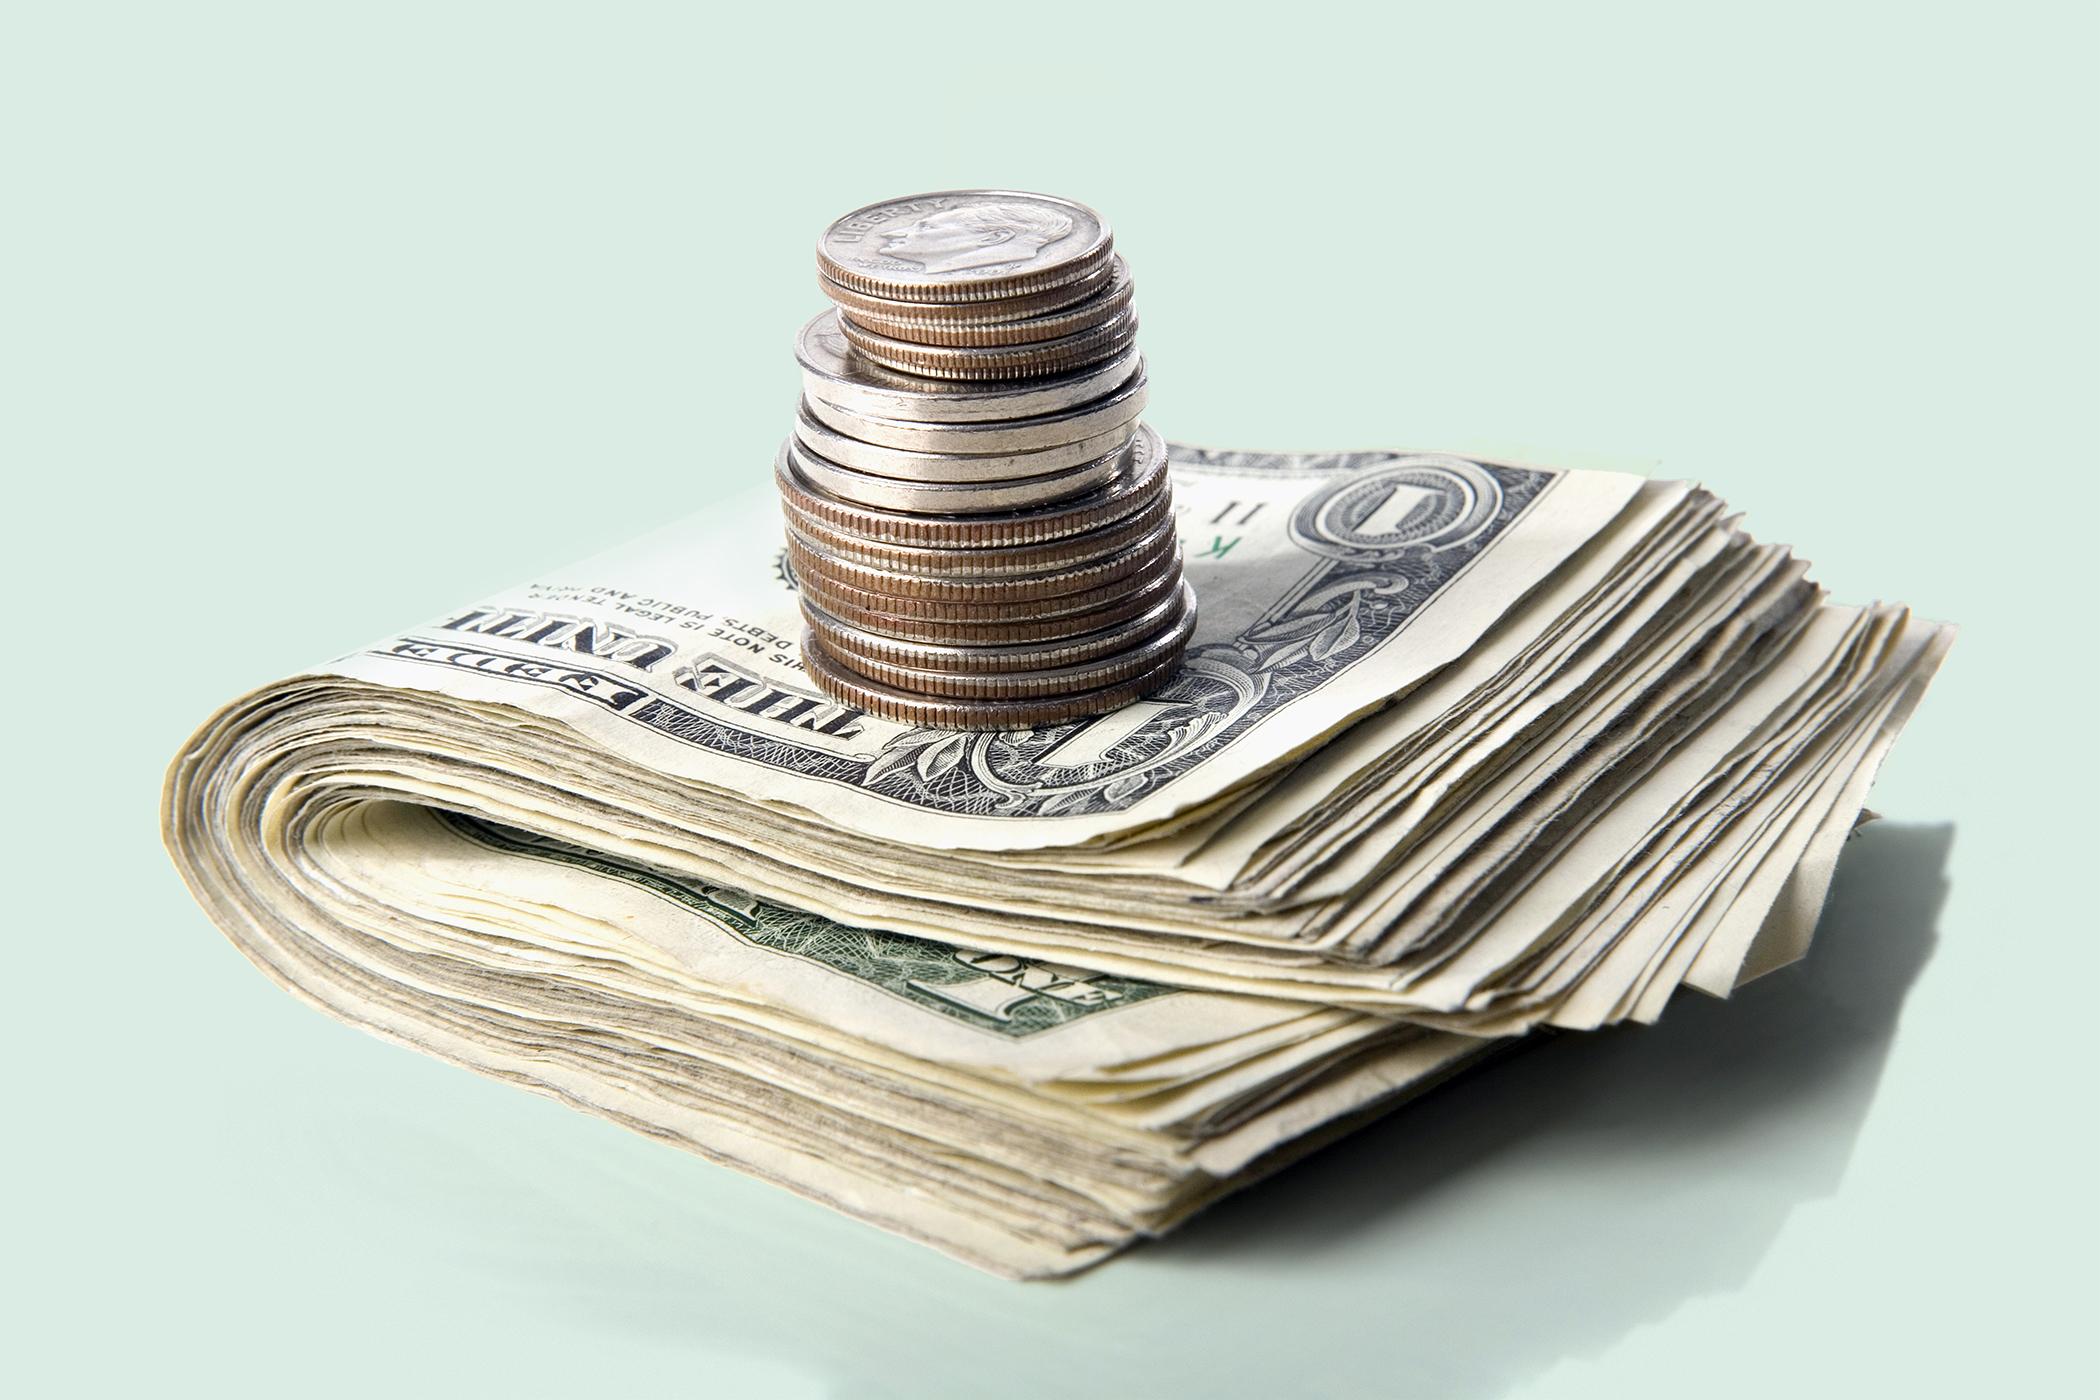 160815_GAL_HurricaneKit_Cash